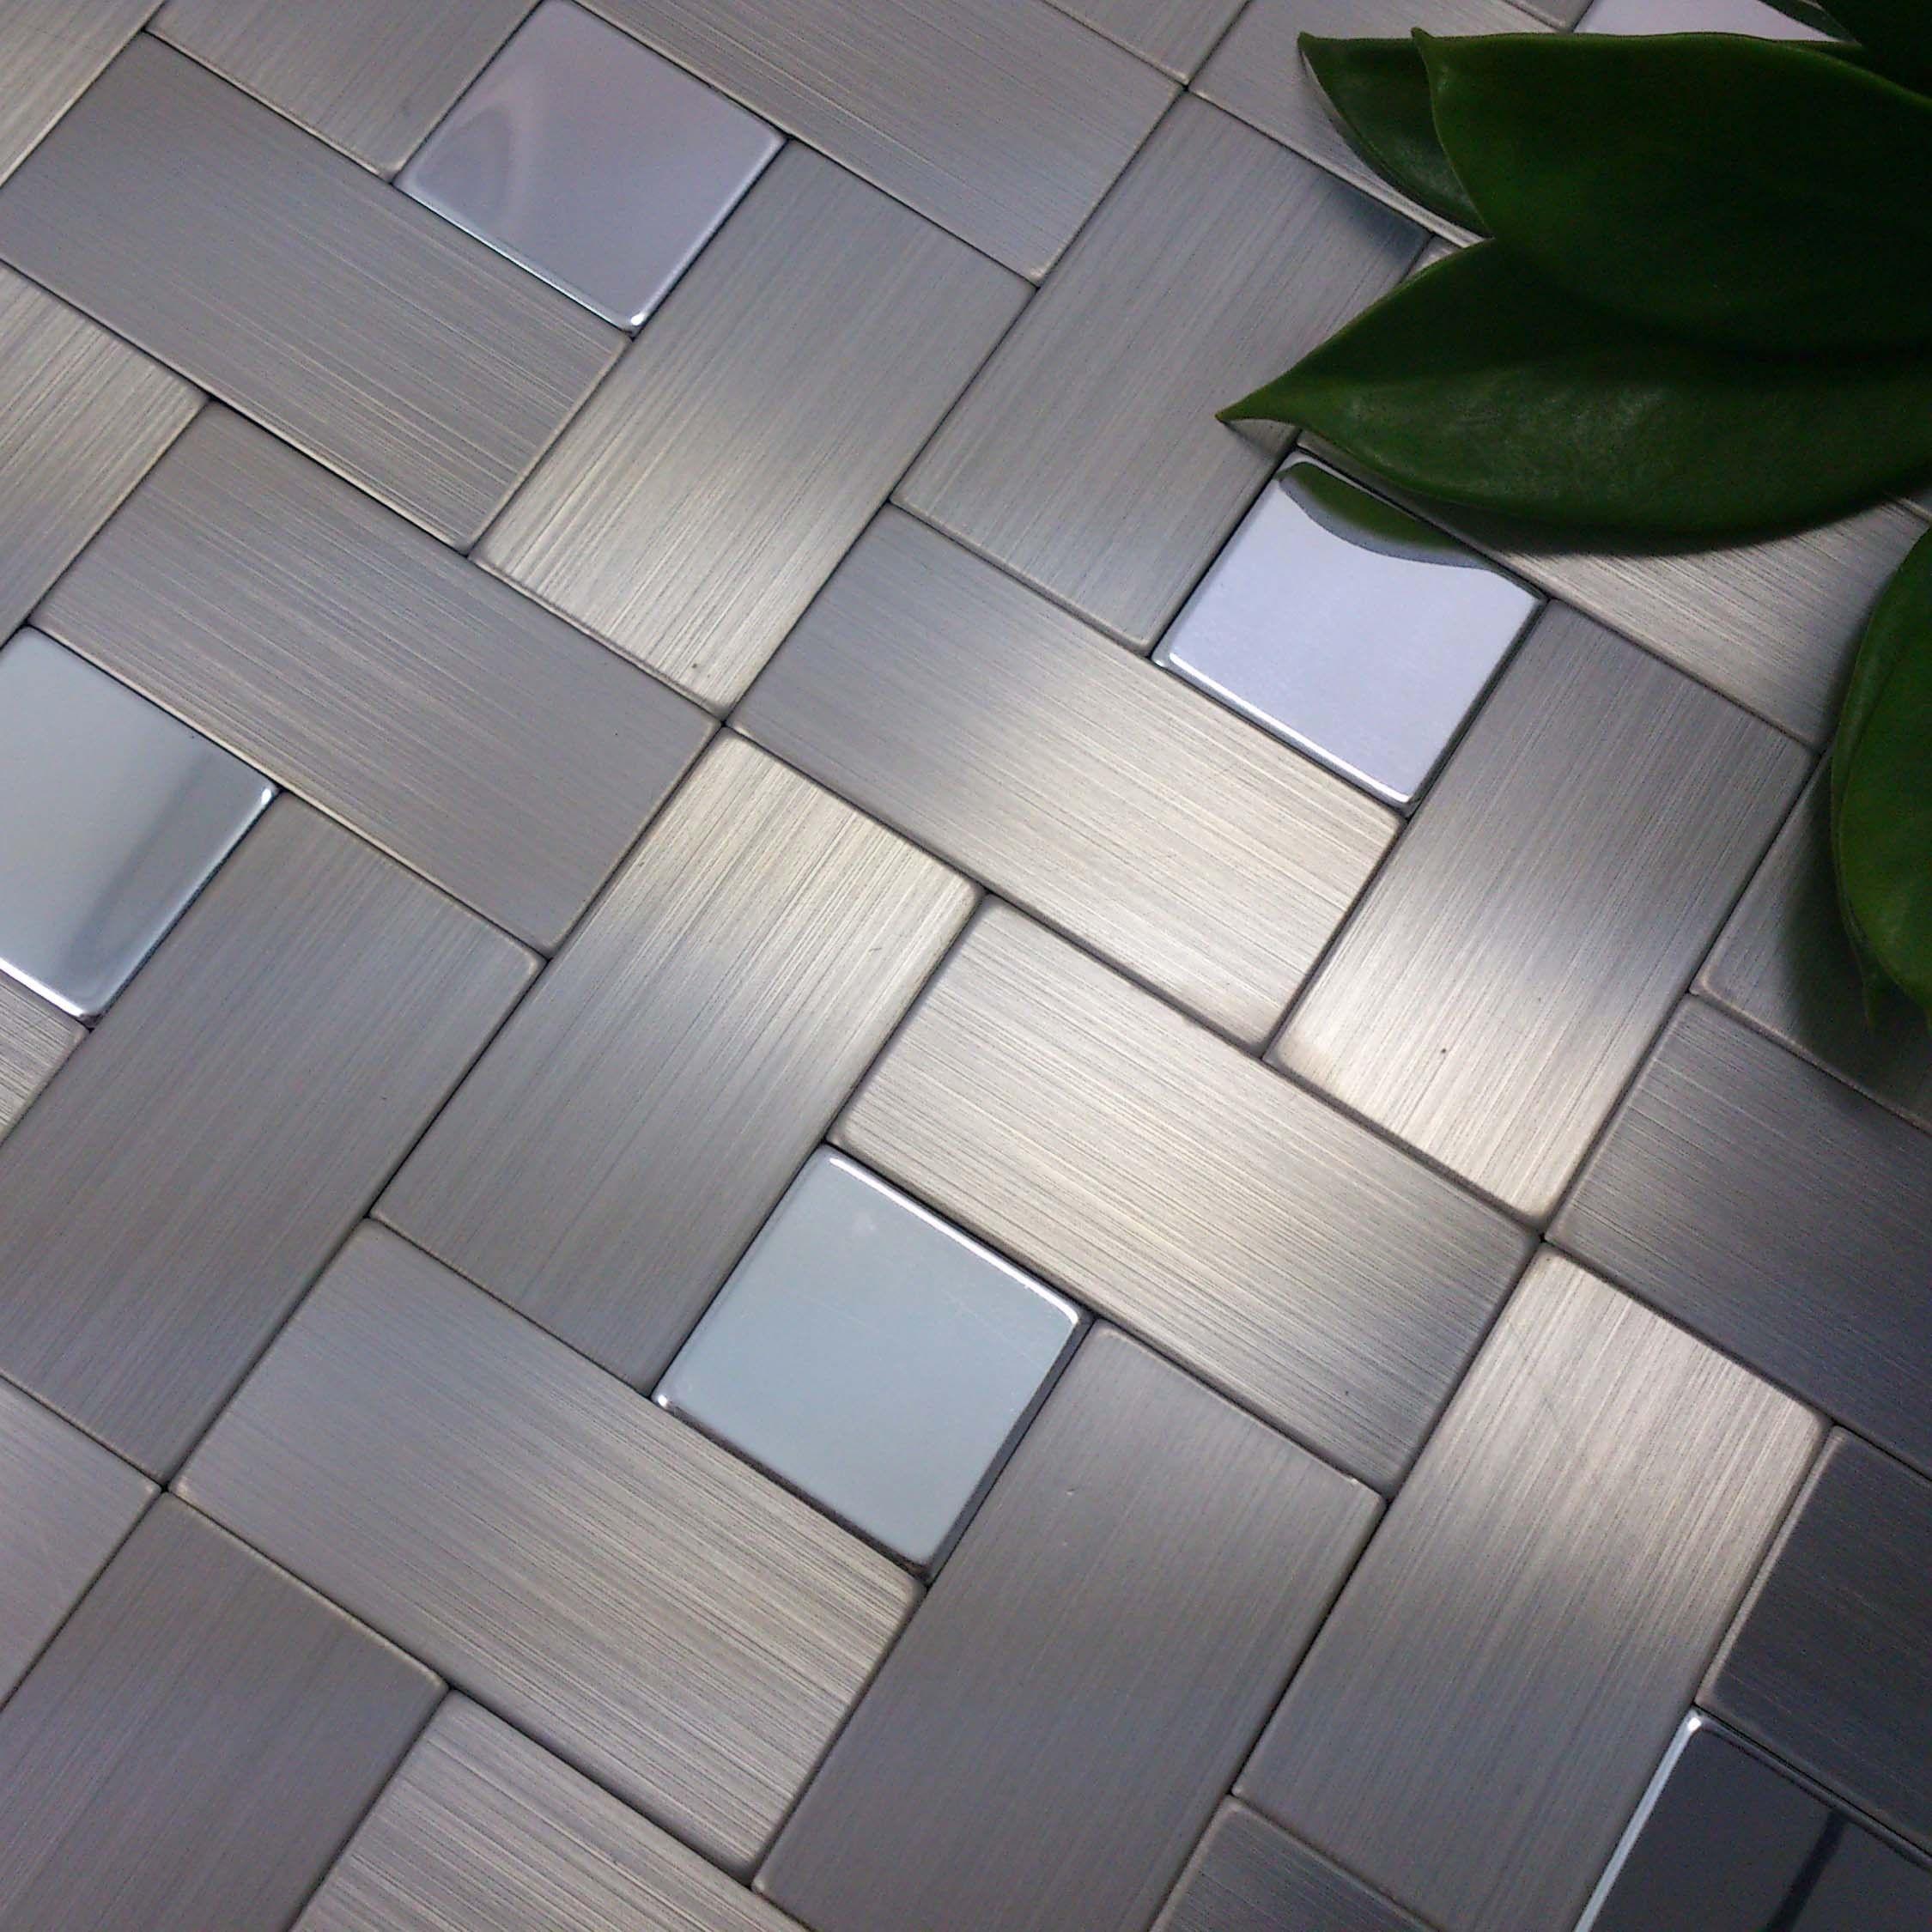 Self Adhesive Vinyl Bathroom Wall Tiles